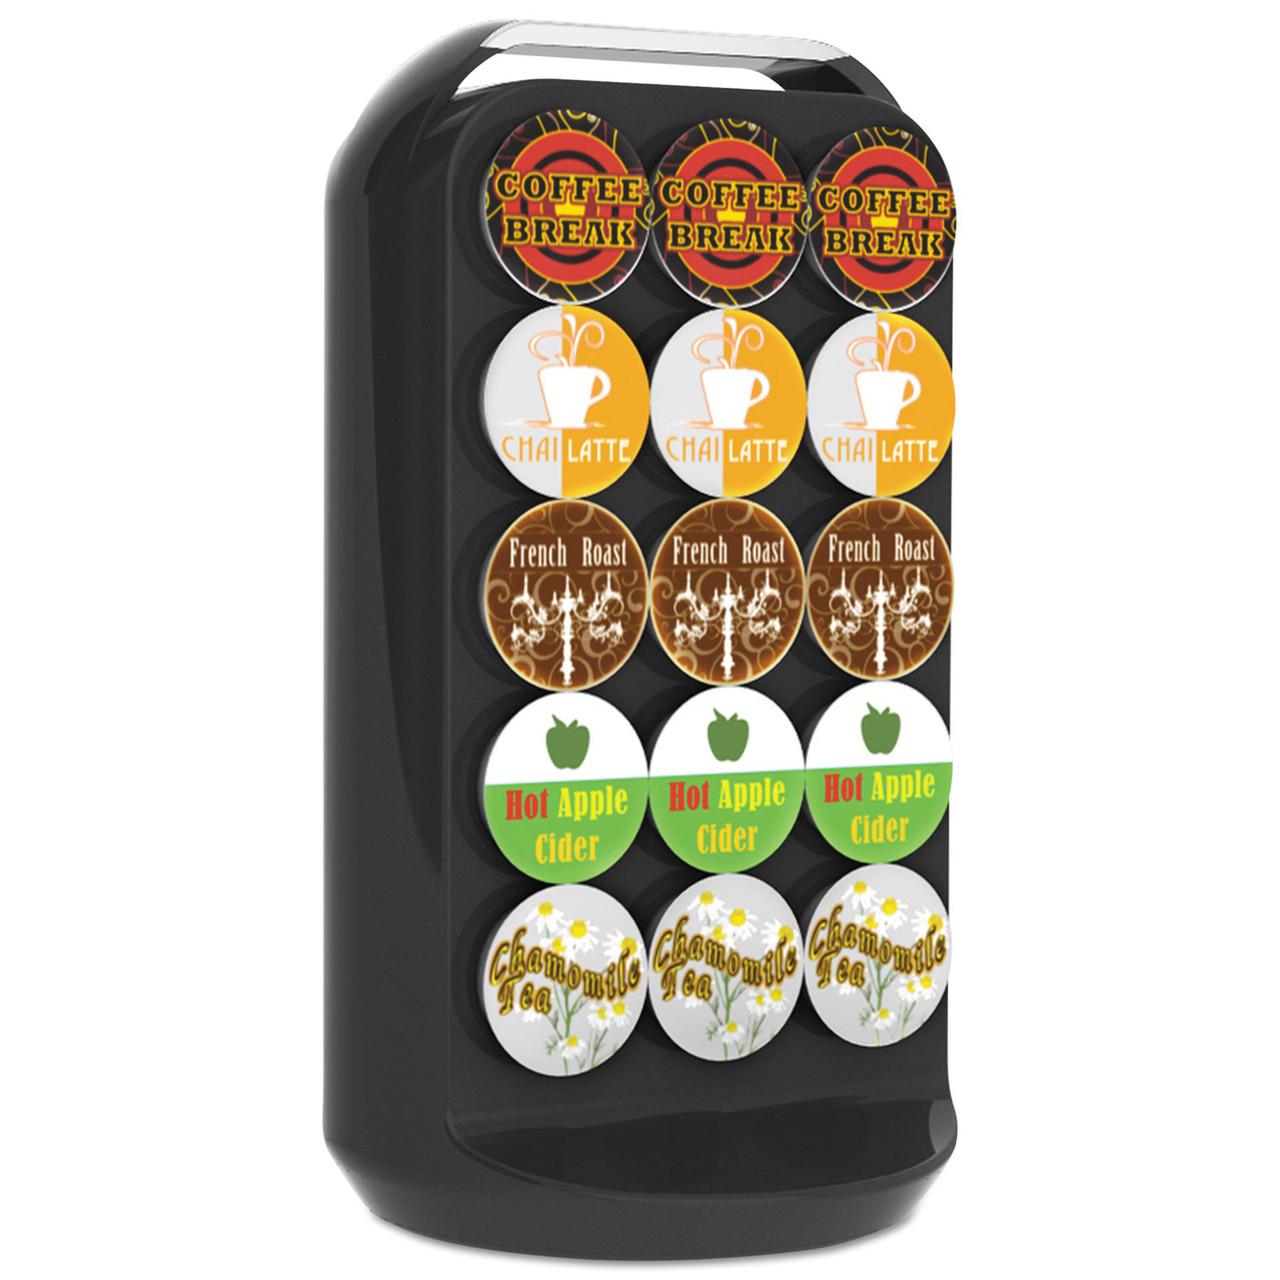 Mind Reader 11-Compartment Coffee Condiment Organizer 18 1//4 x 6 5//8 x 9 7//8